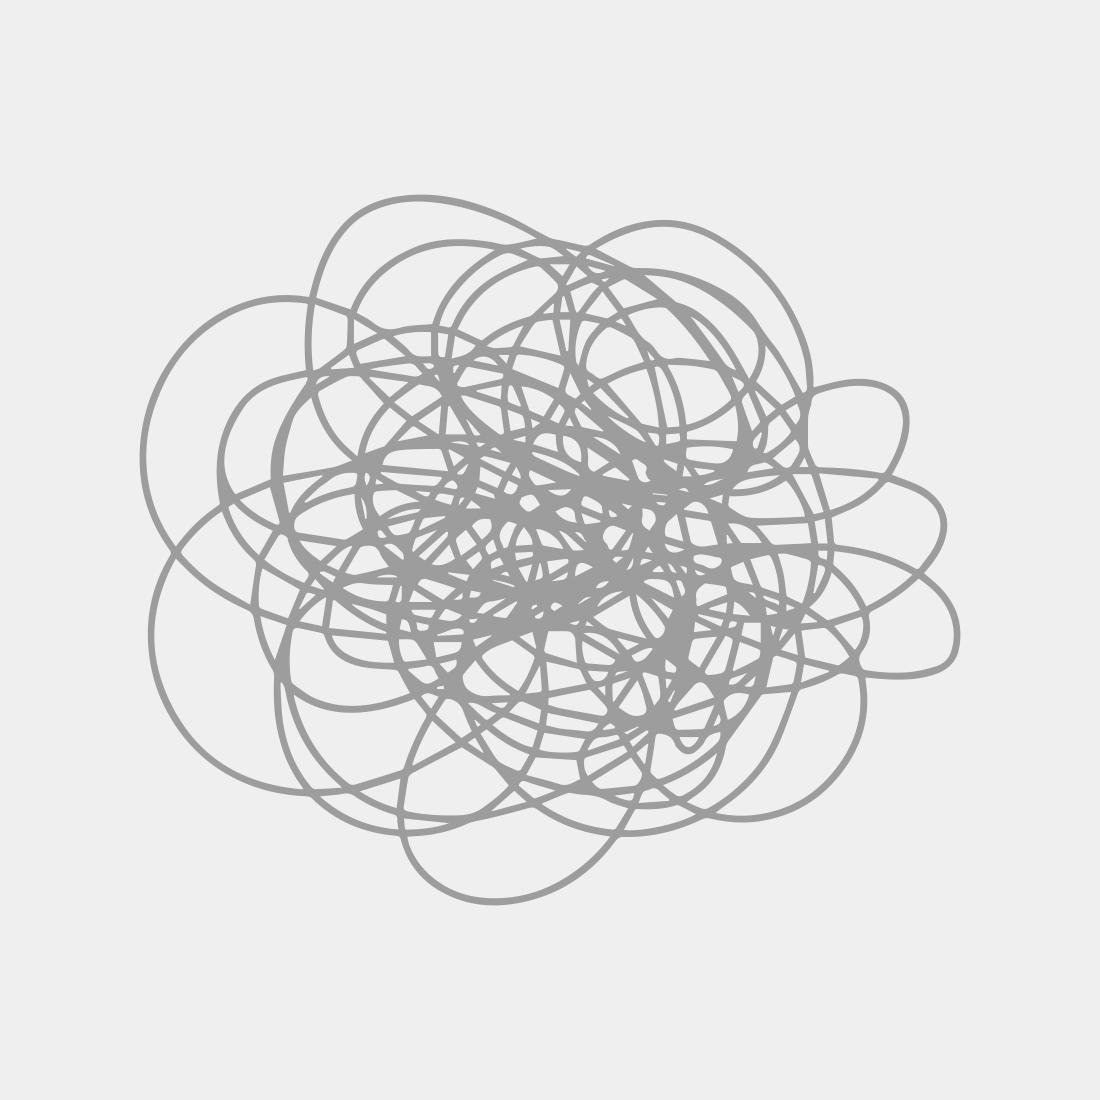 Van Gogh Colouring Book